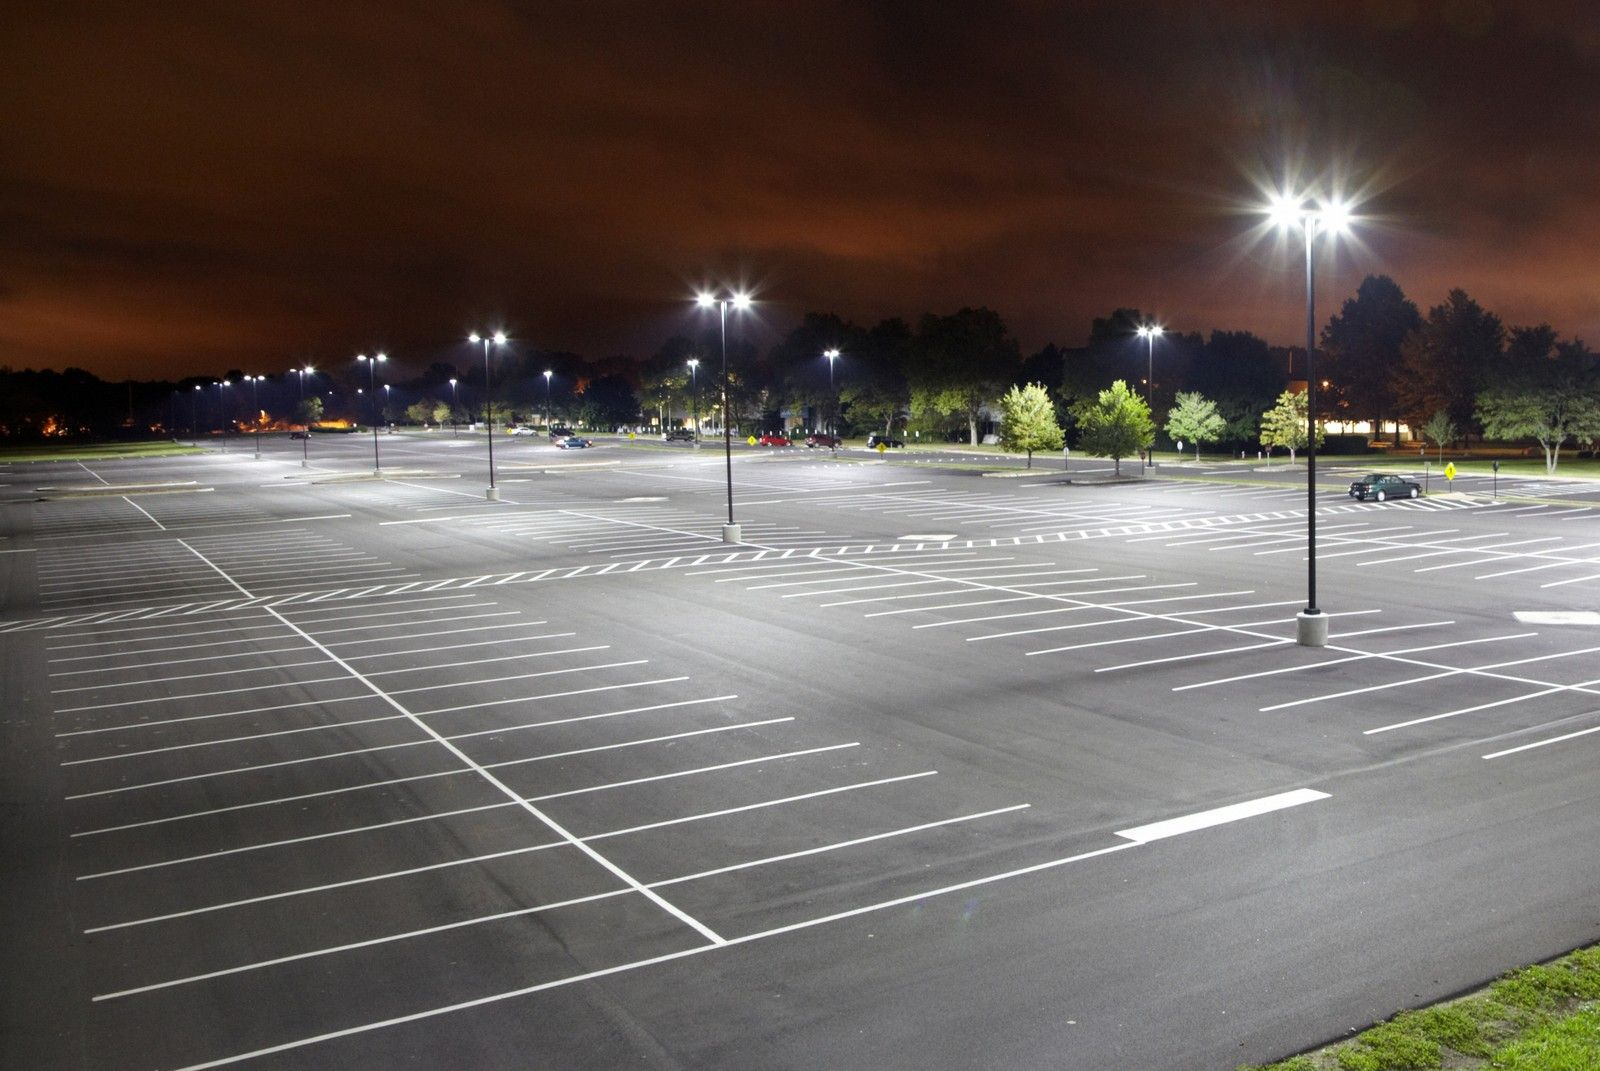 Commercial Led Lighting Contractors Las Vegas Phoenix Global Lighting Tech Parking Lot Lighting Solar Led Lights Led Parking Lot Lights